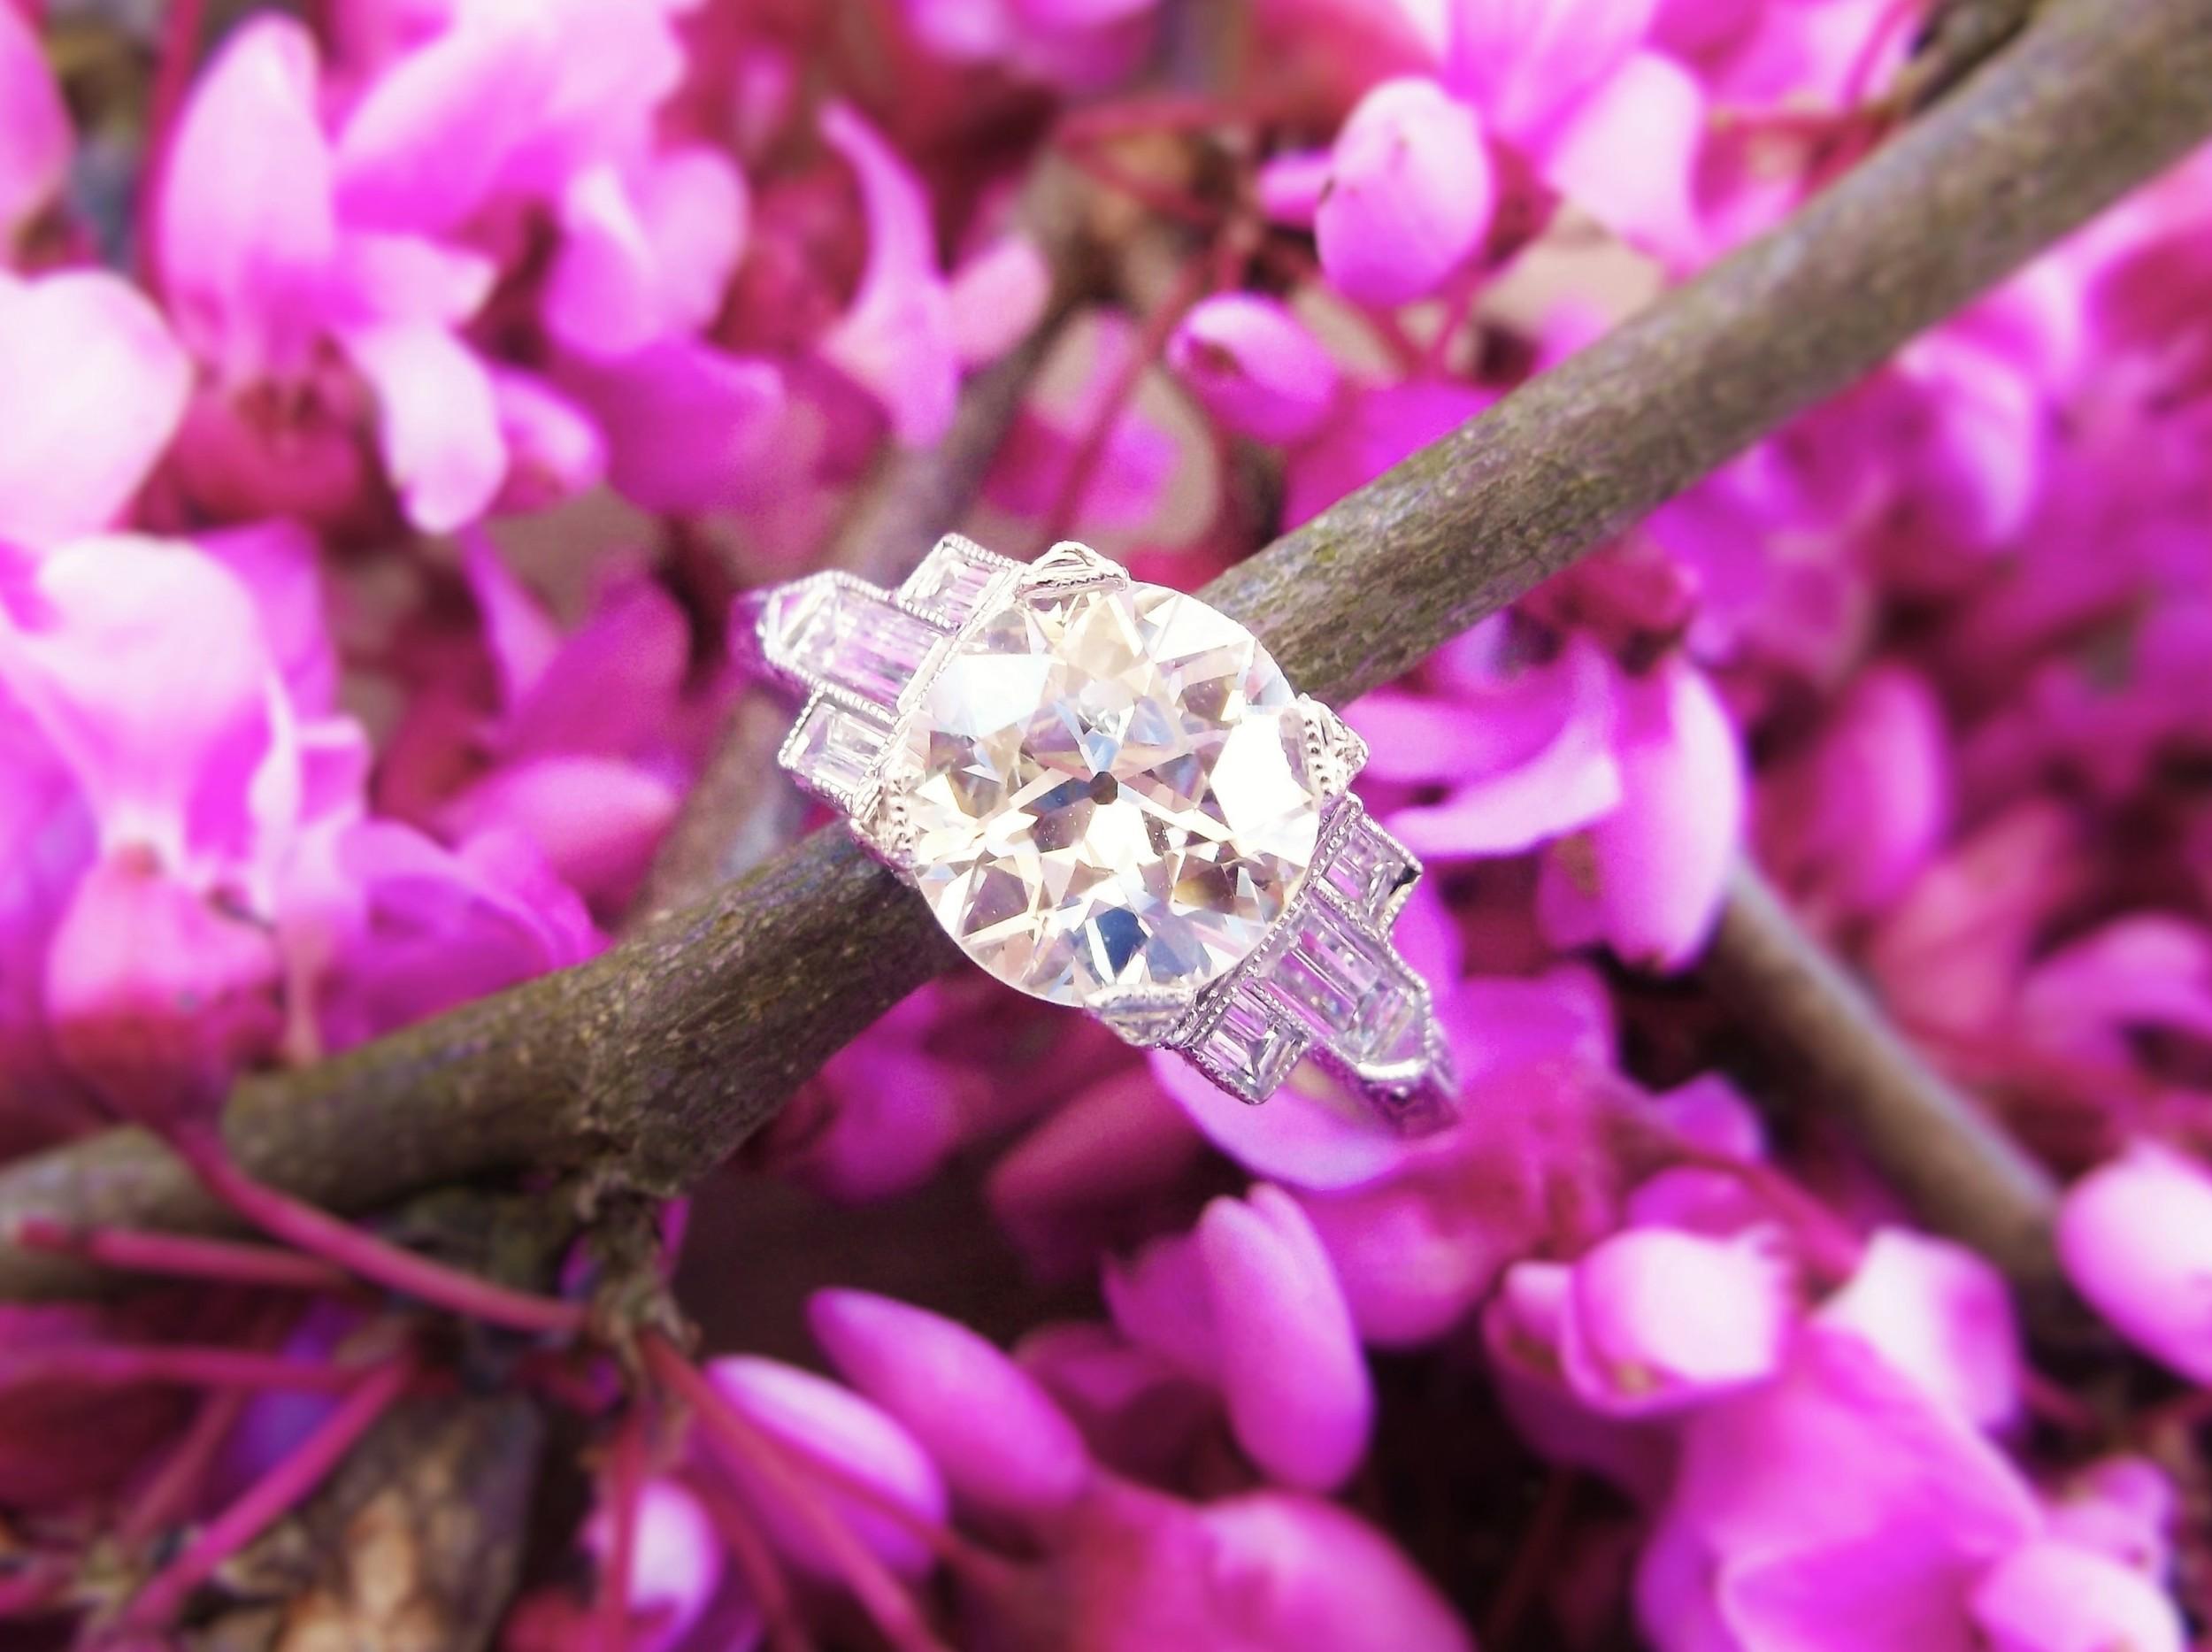 SOLD - Stunning 1.63 carat Old European cut diamond set in a beatiful baguette diamond and platinum mounting.